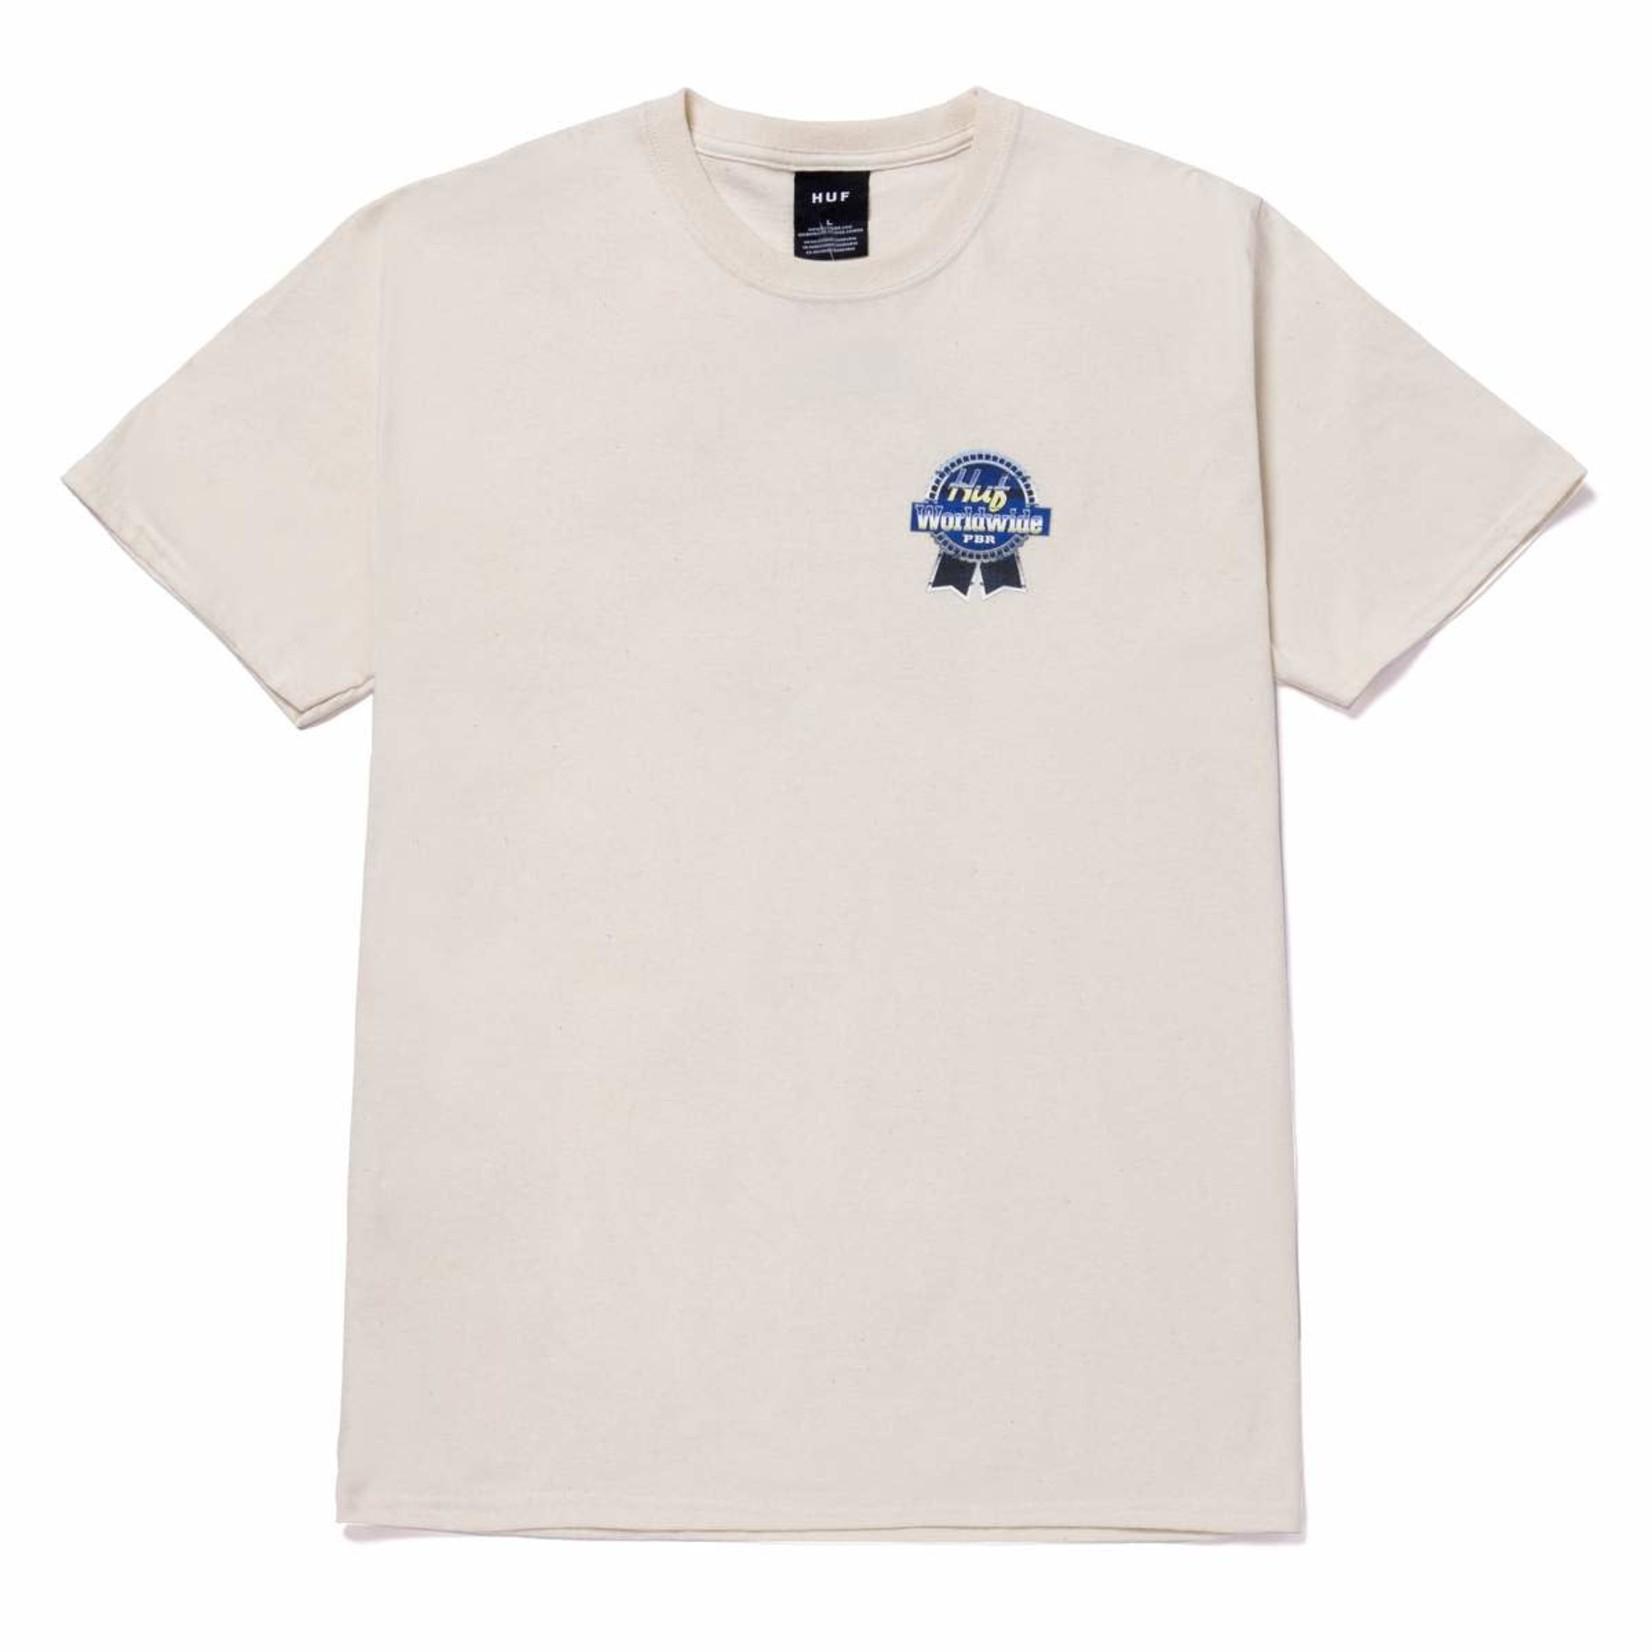 Huf Huf x Pabst Chrome Ribbon T-Shirt